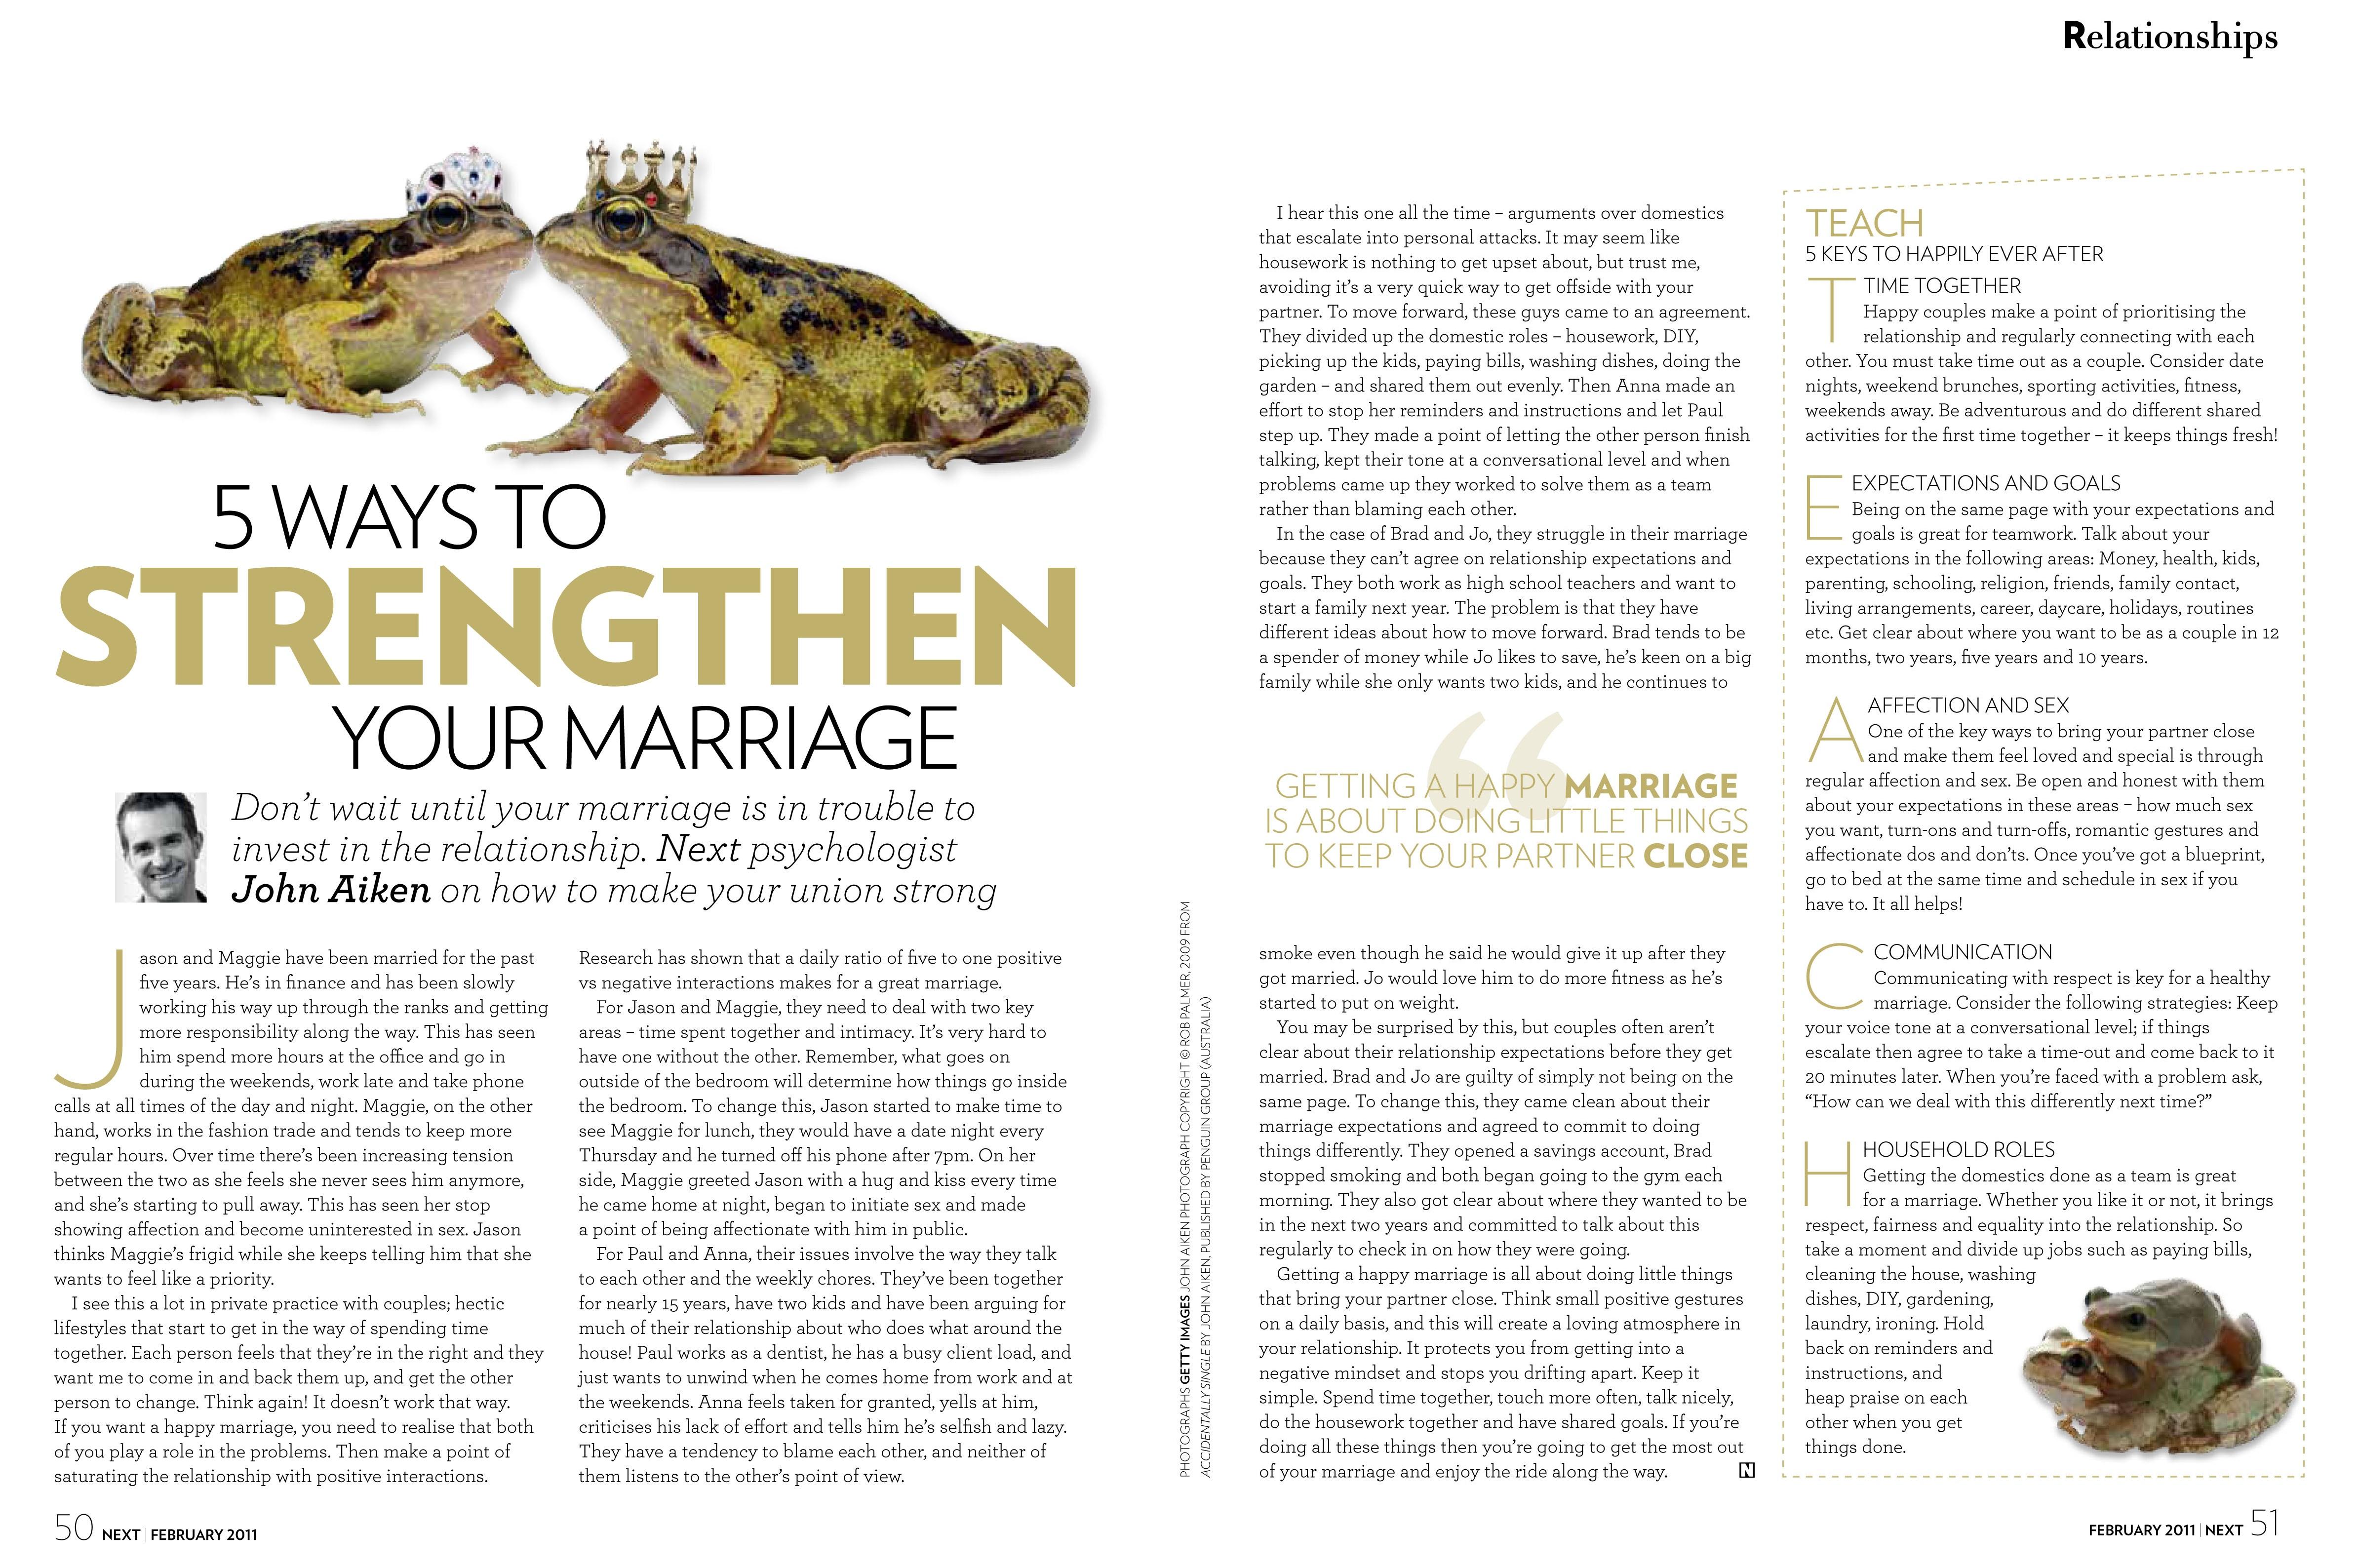 5 Ways To Strengthen Your Marriage - John Aiken